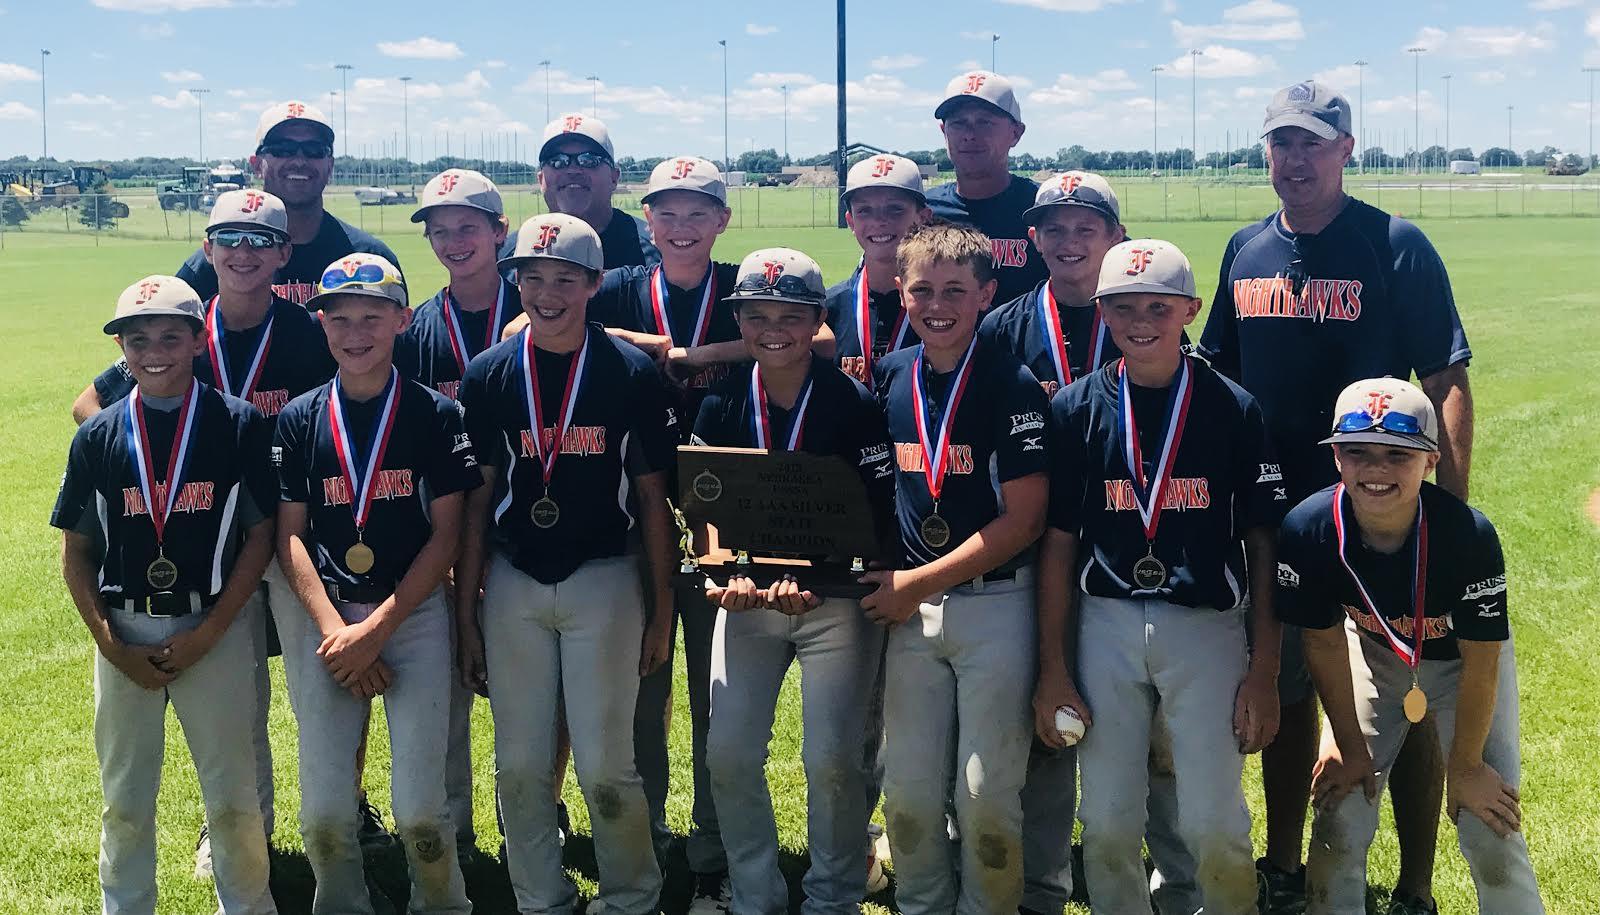 2018 USSSA State Champions